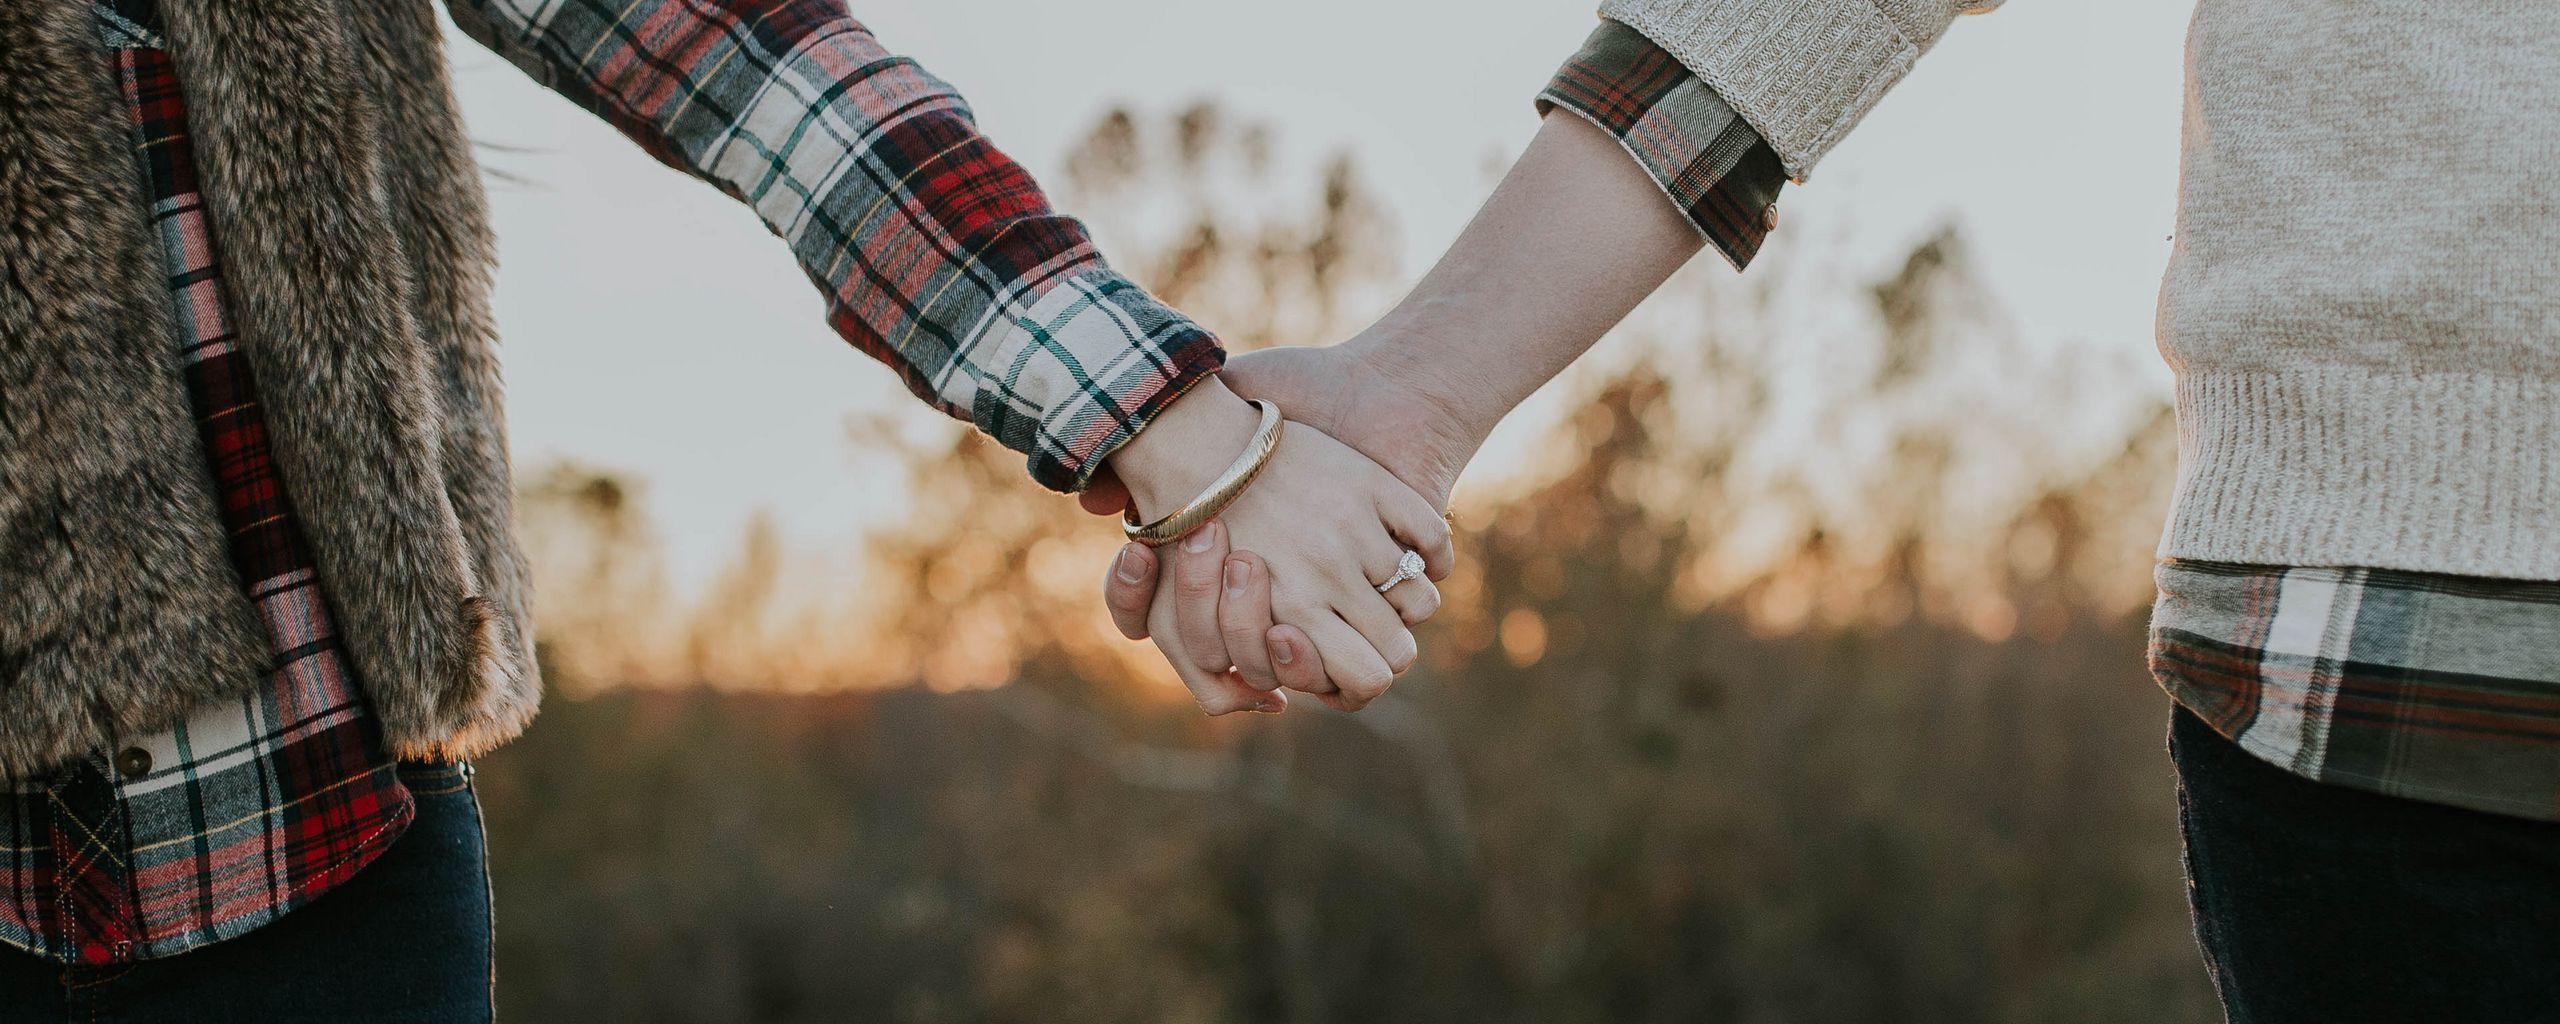 2560x1024 Wallpaper couple, hands, tenderness